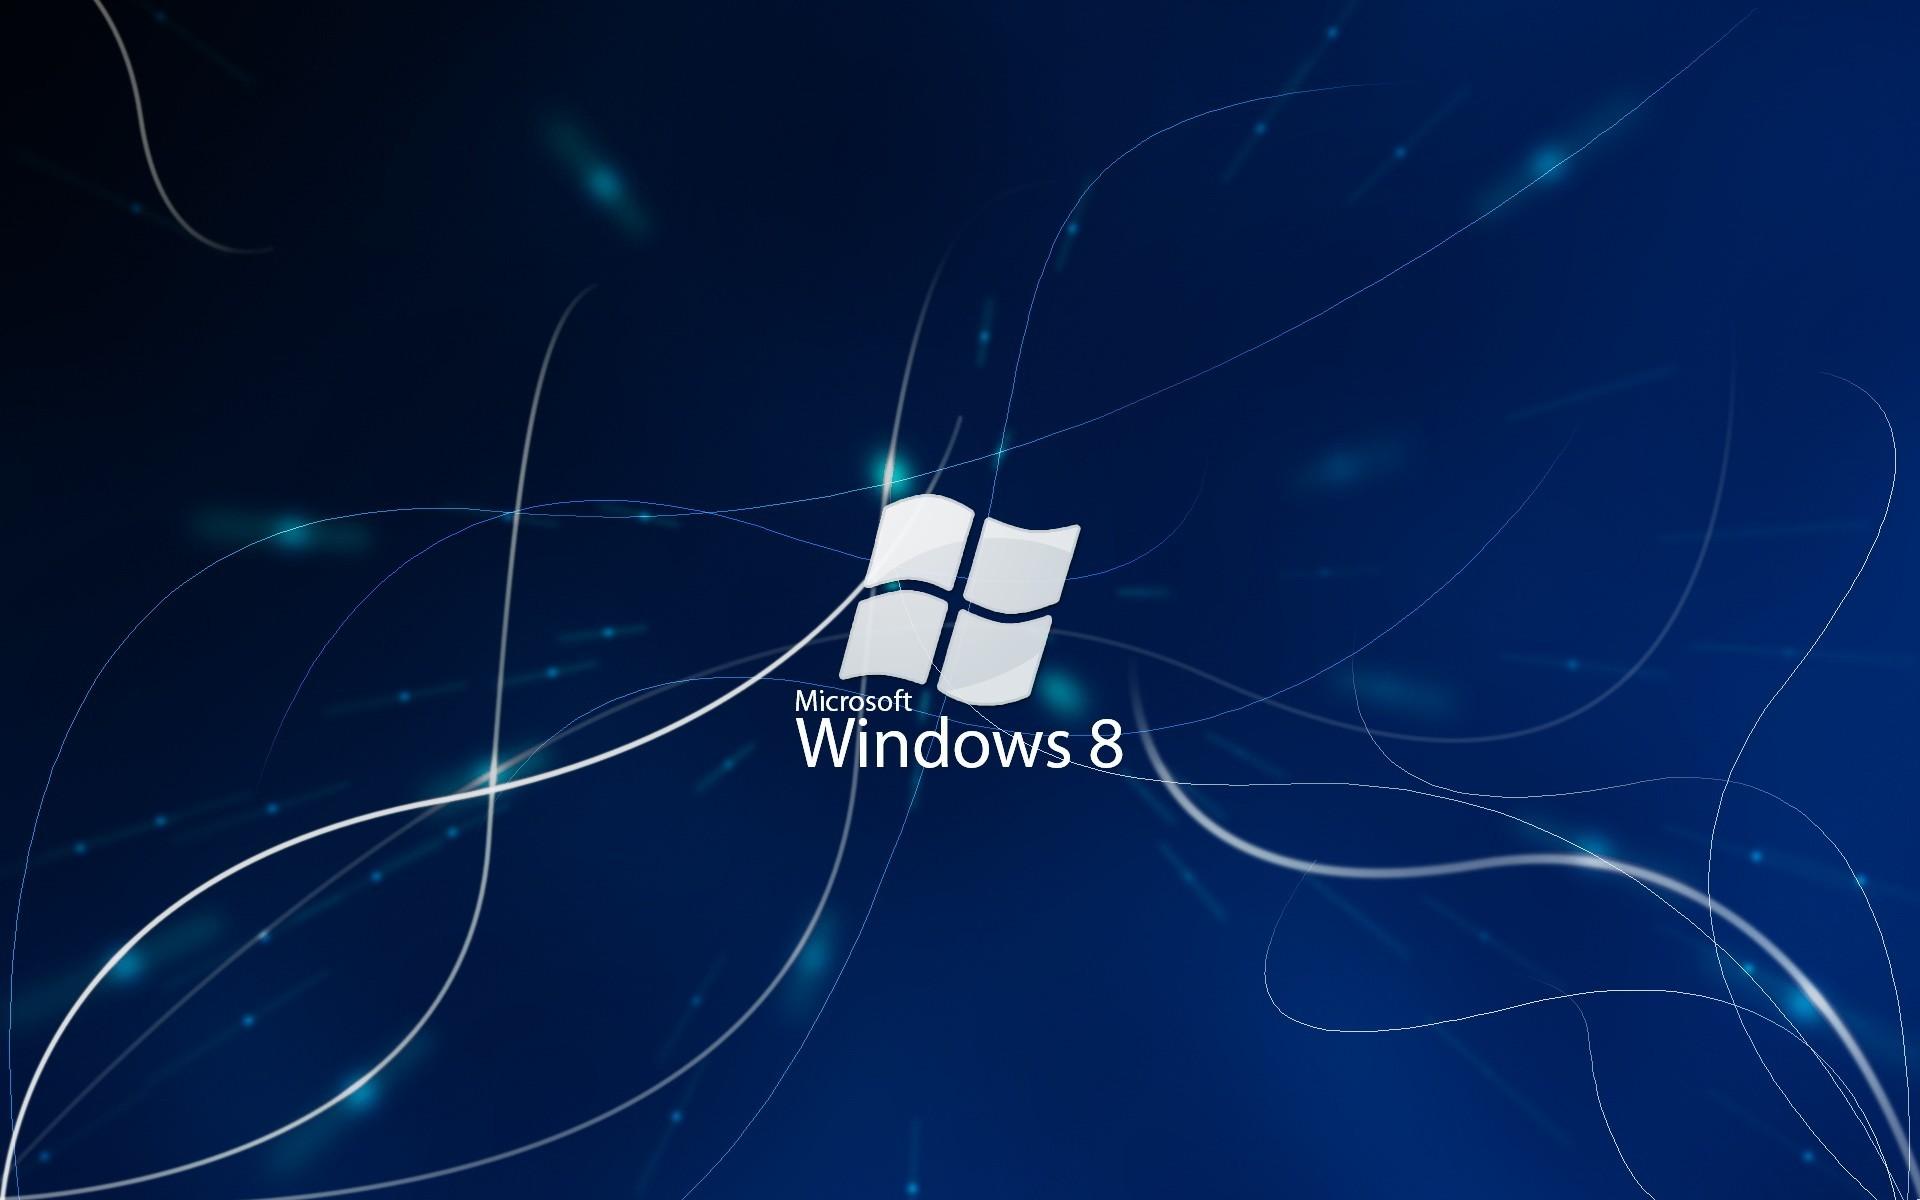 Wallpaper Windows 8  № 1929108 загрузить